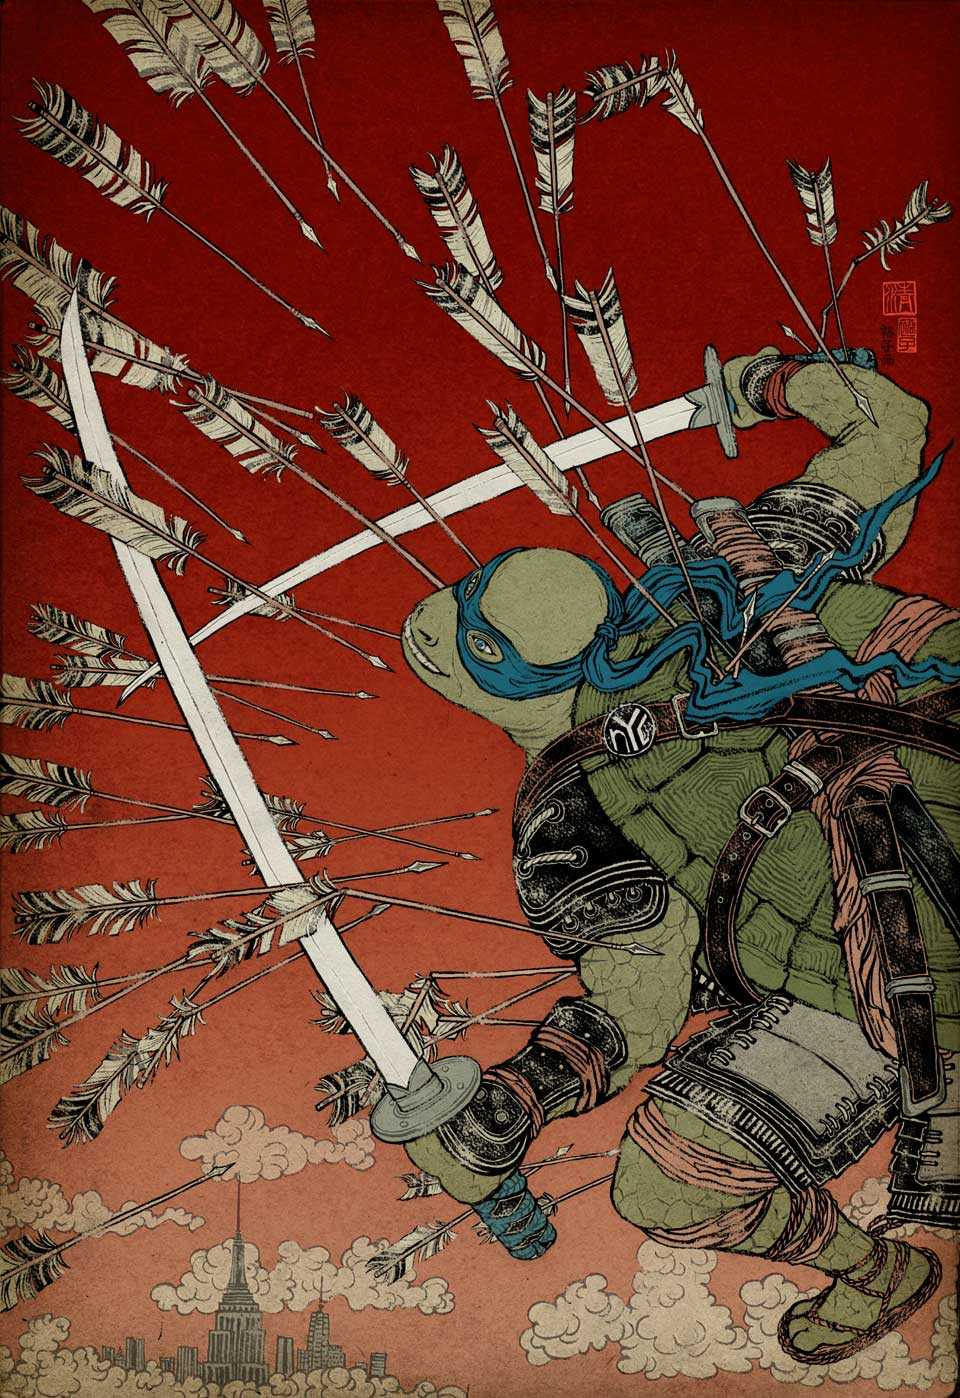 Yuko Shimizu - Teenage Mutant Ninja Turtles for Paramount Pictures -